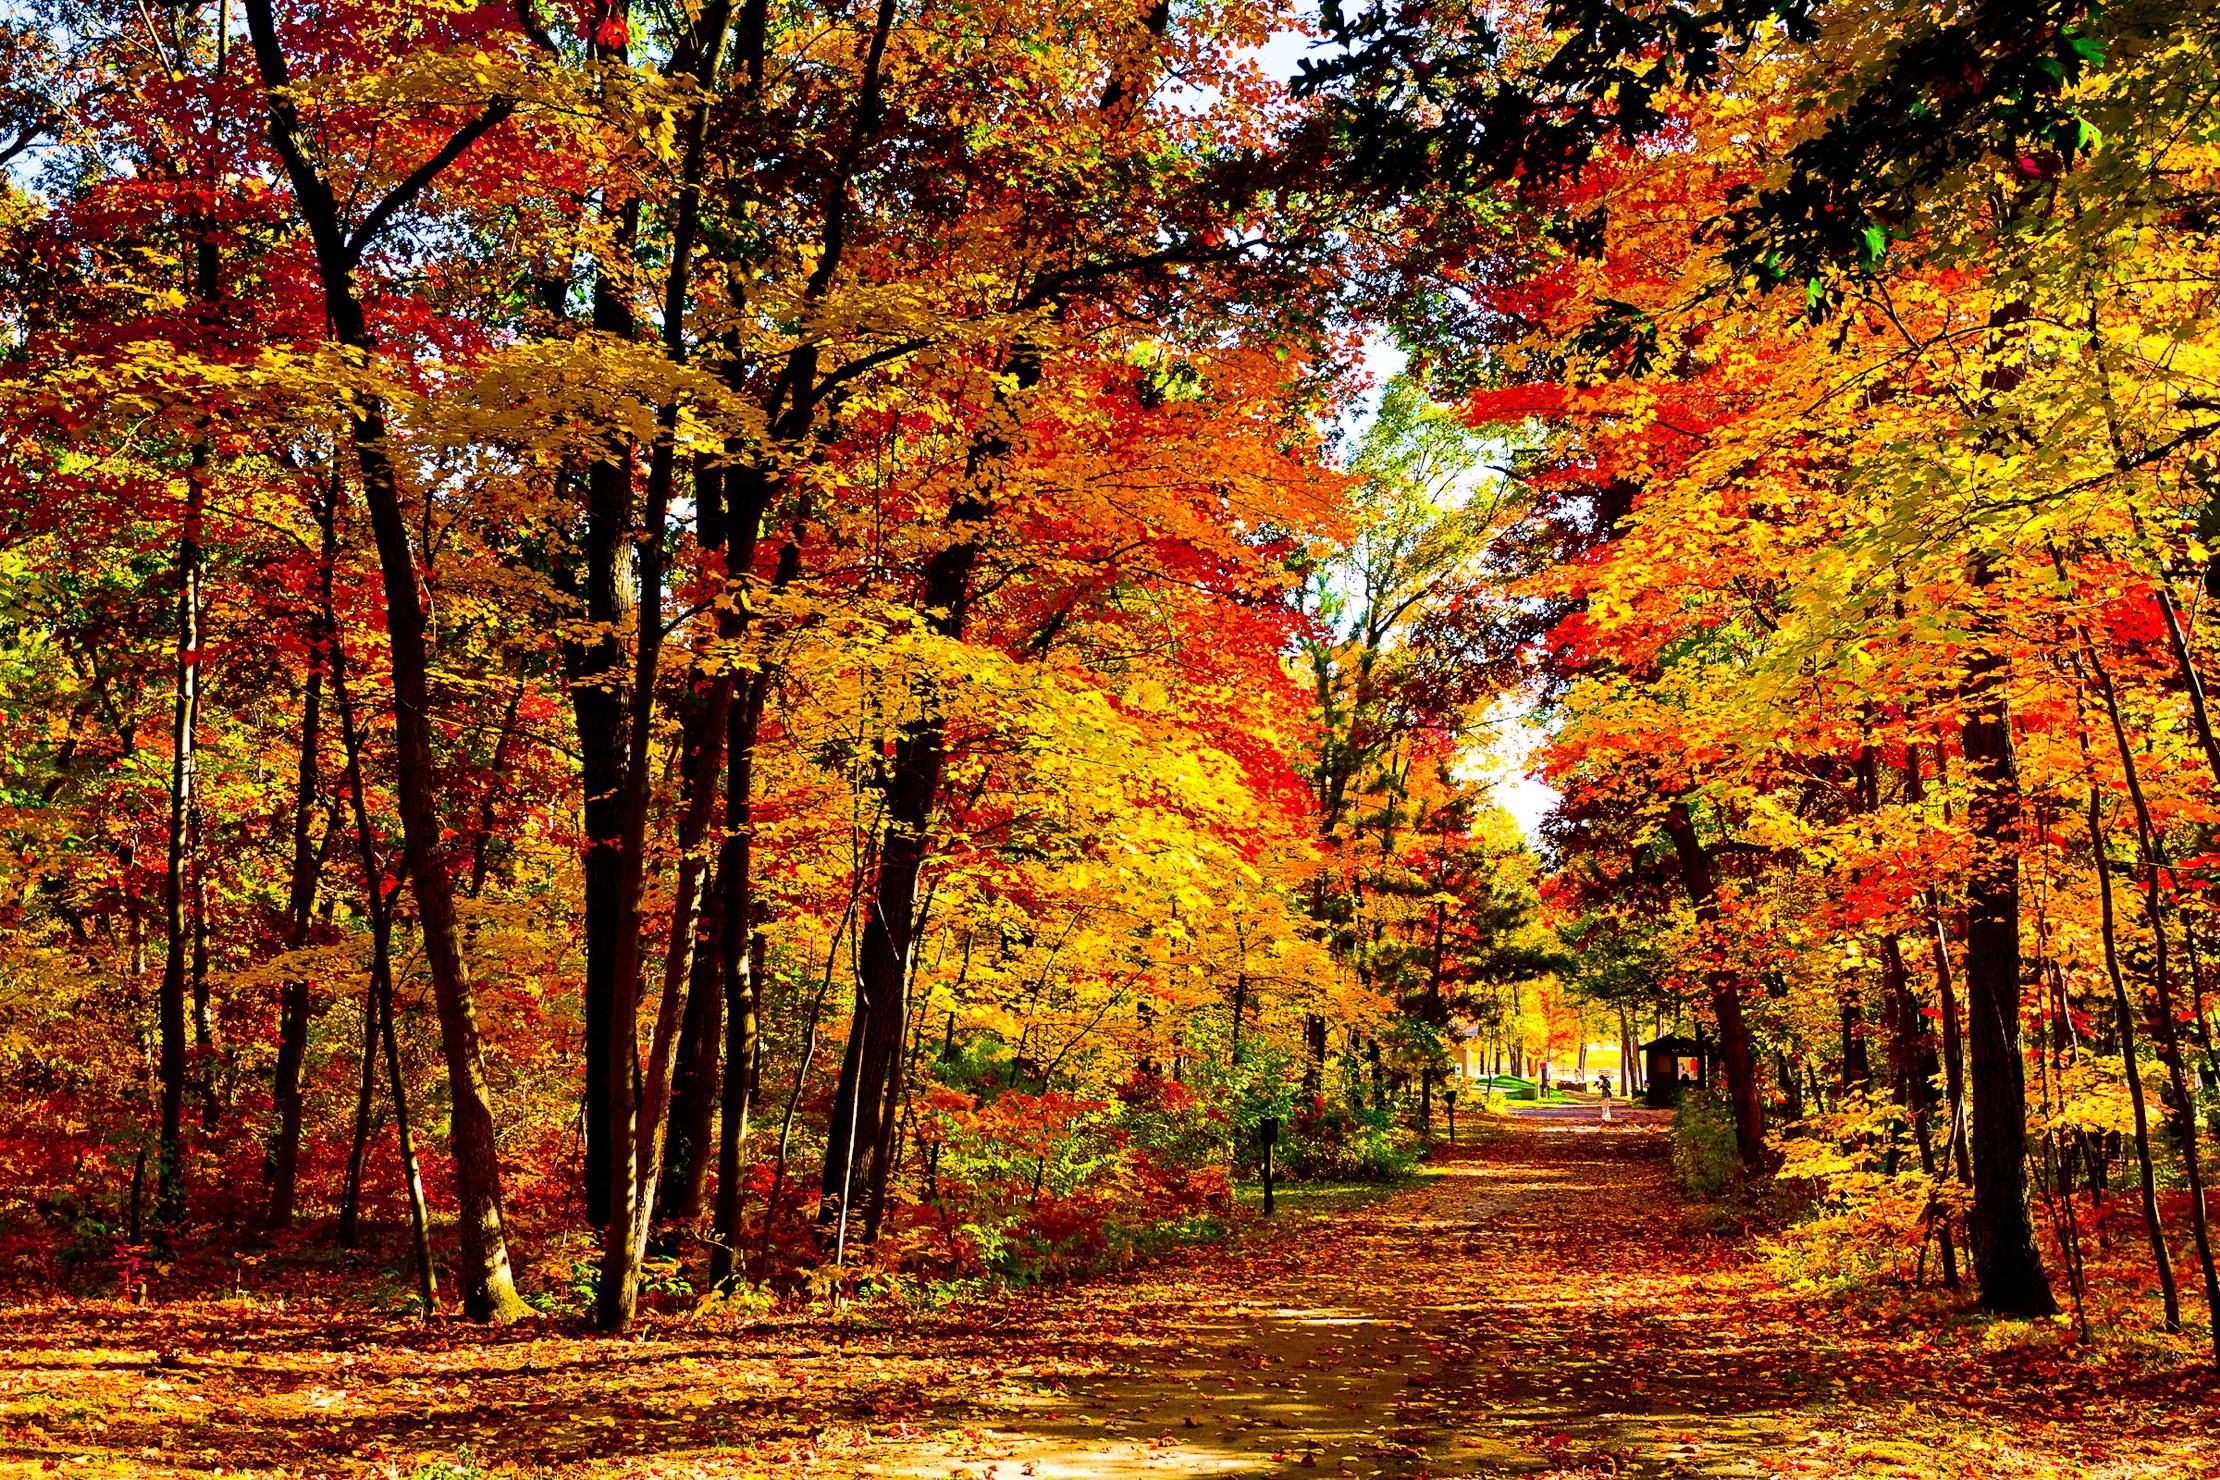 wood-yellow-trees-nature-landscape-autumn-1080p-wallpaper